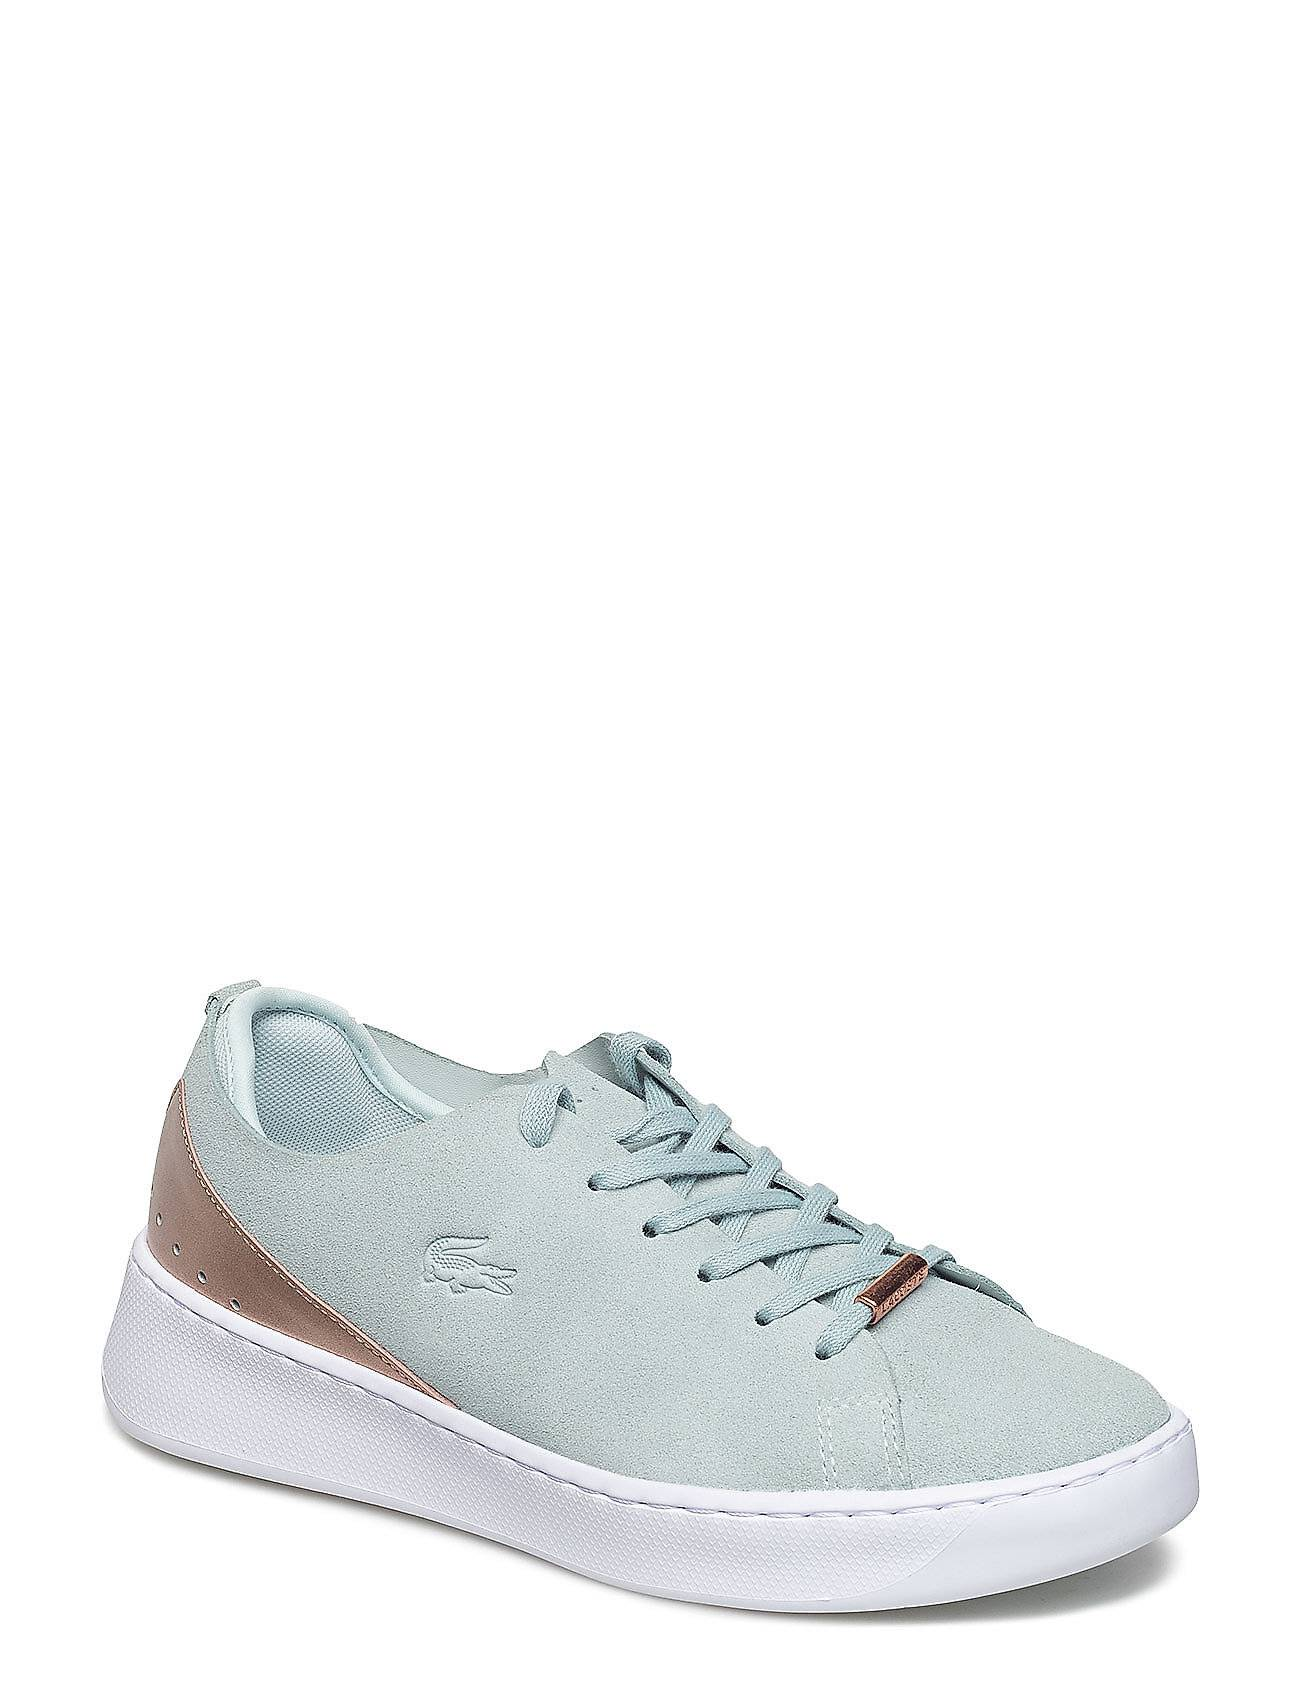 Image of Lacoste Shoes Eyyla 218 2 Qsp Matalavartiset Sneakerit Tennarit Sininen Lacoste Shoes